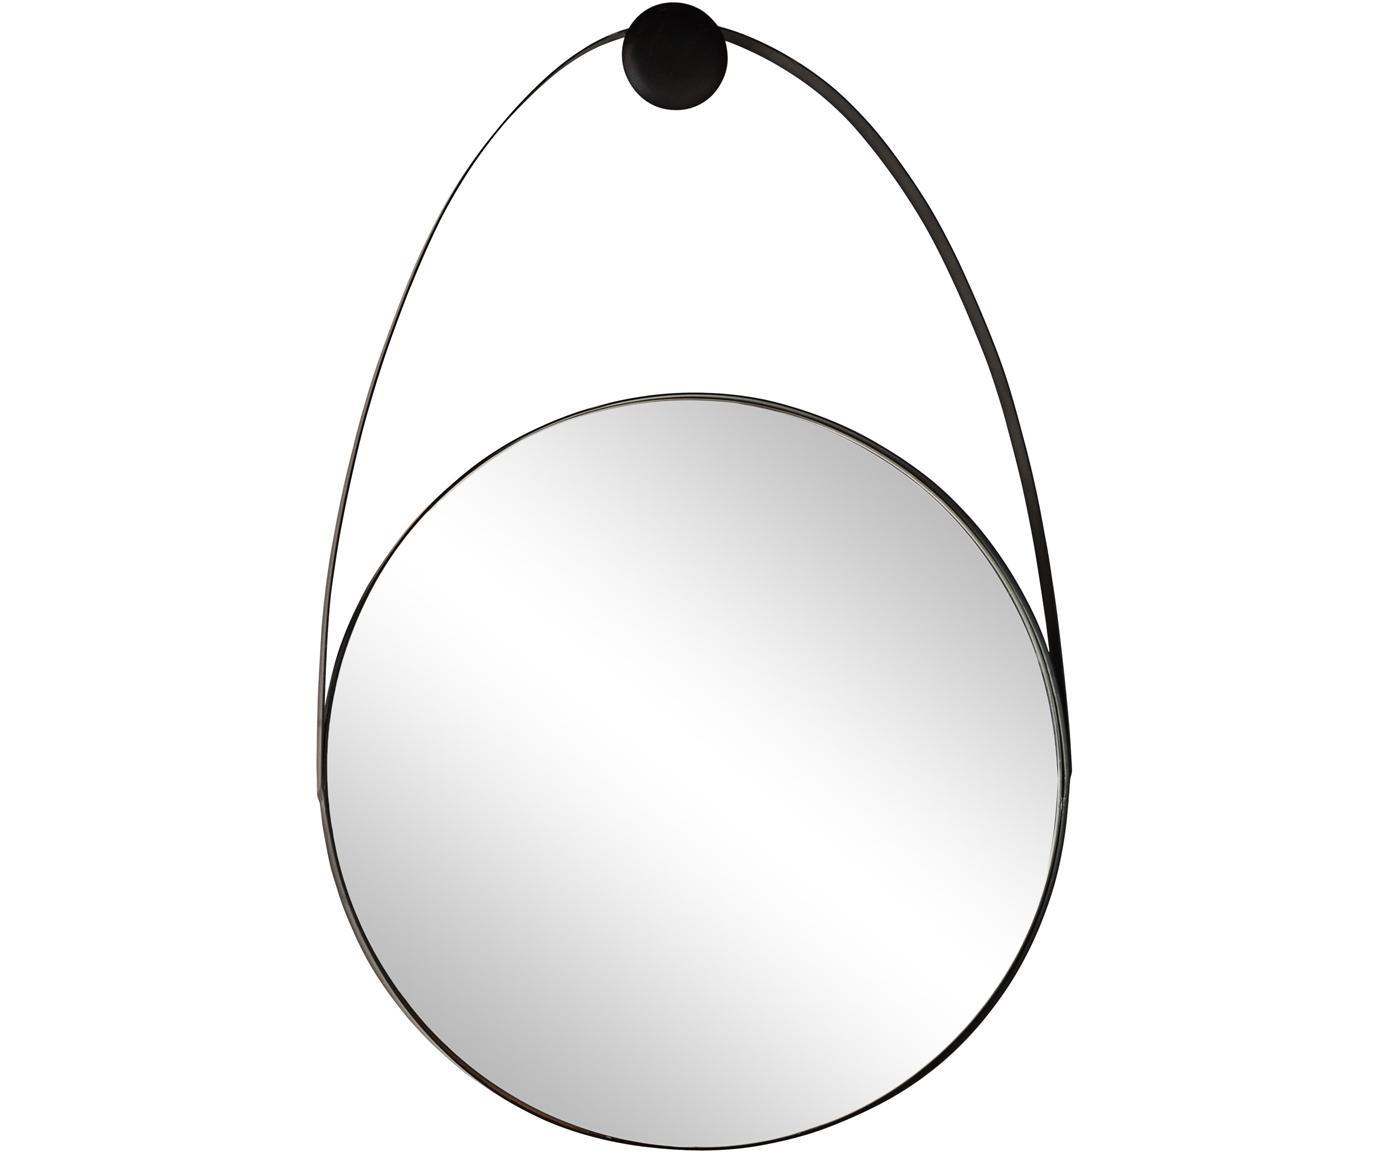 Espejo de pared Kieran, con marco de metal, Espejo: espejo de cristal, Negro, An 46 x Al 68 cm